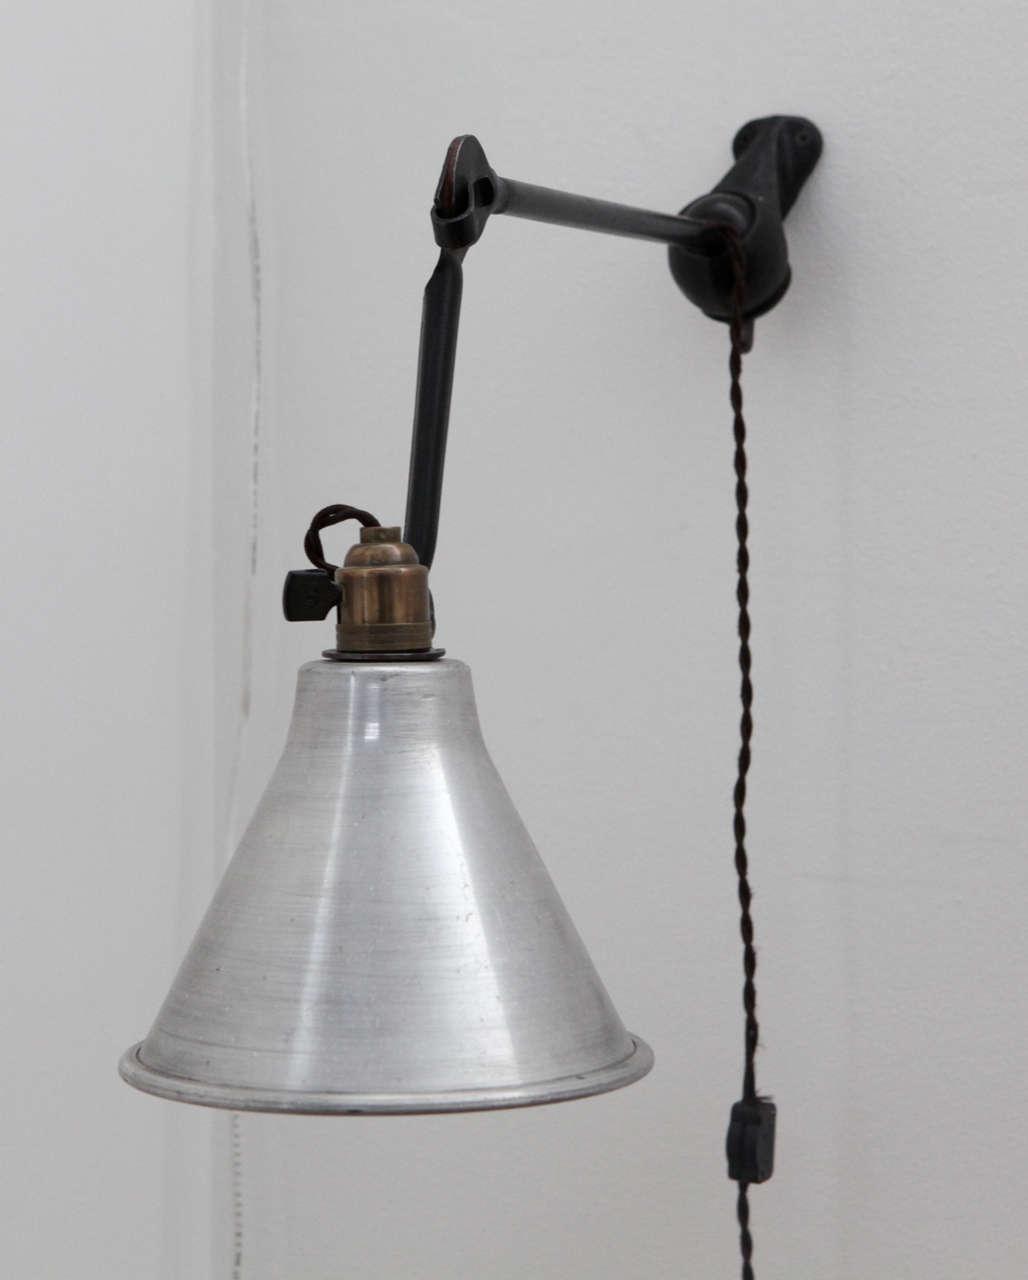 pair of la lampe gras wall appliqu s france 1920 at 1stdibs. Black Bedroom Furniture Sets. Home Design Ideas